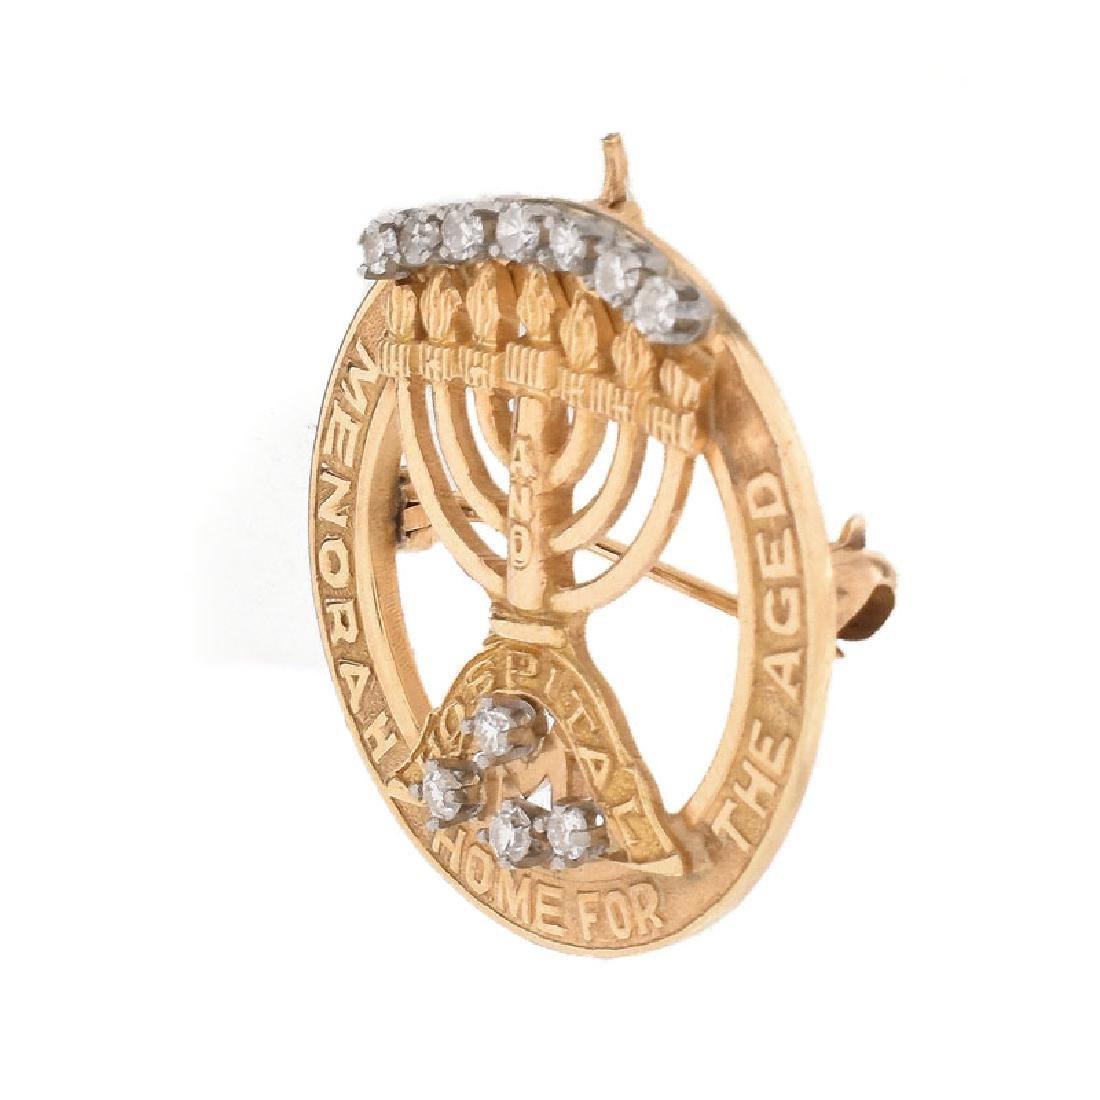 Three (3) Piece Vintage Judaica Jewelry Lot Including - 9